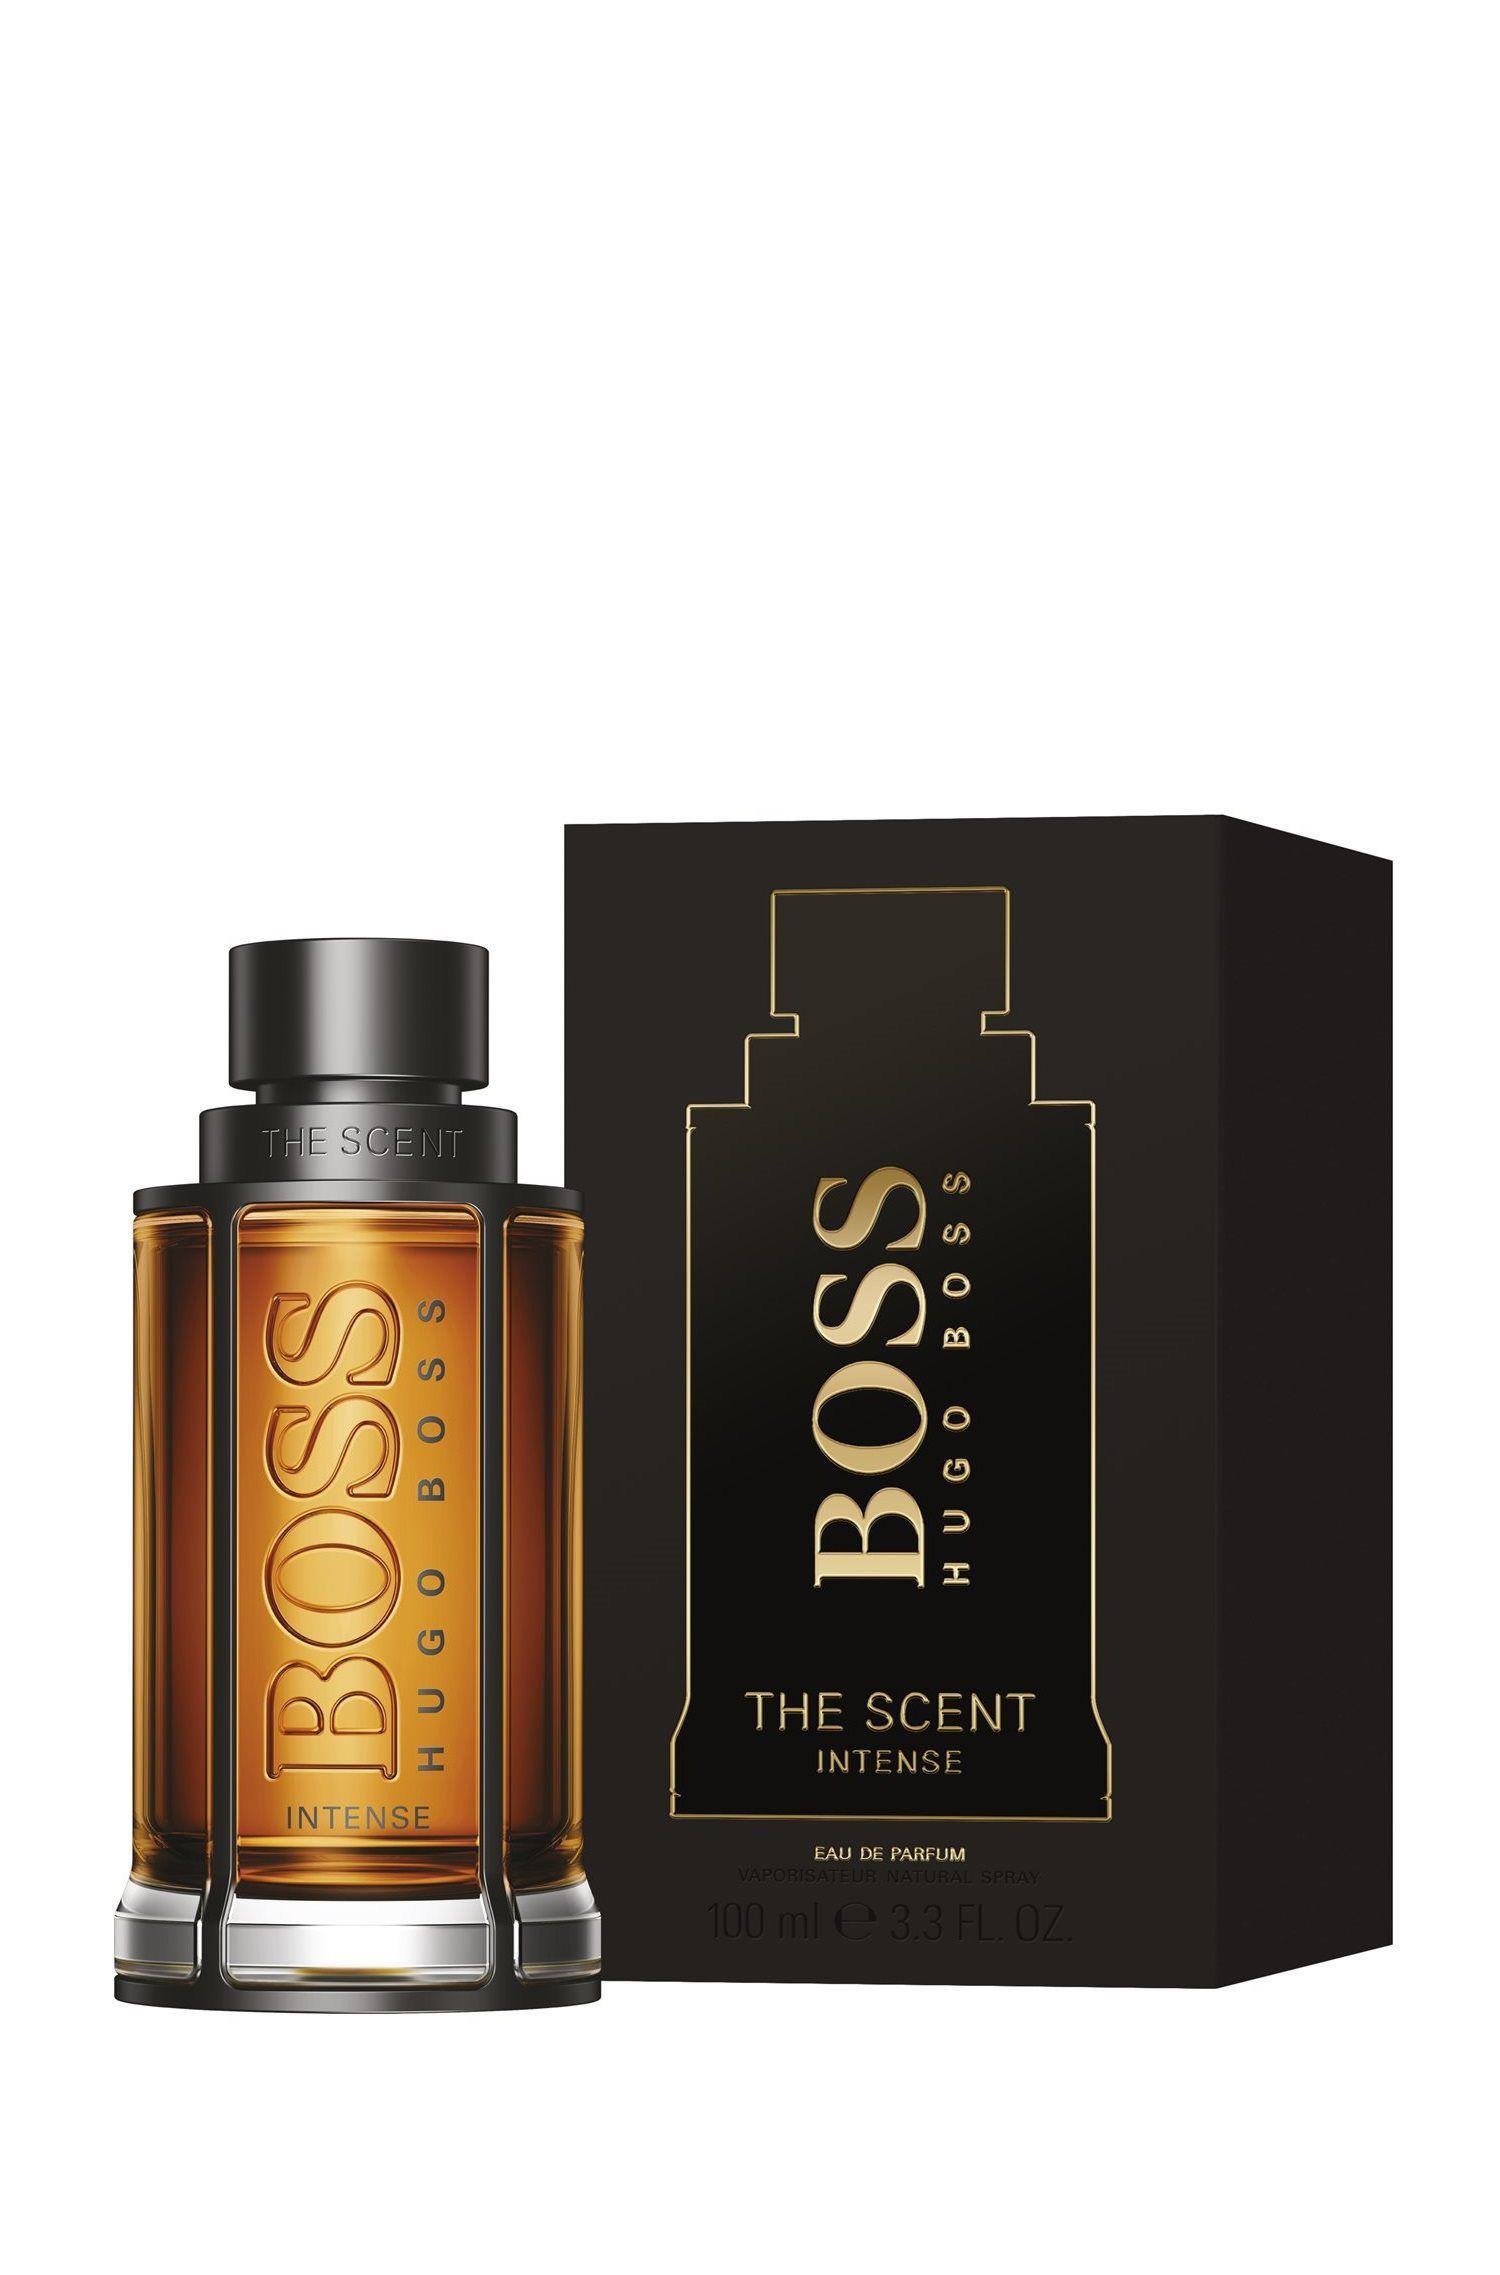 BOSS The Scent Intense for Him eau de parfum 100ml , Assorted-Pre-Pack